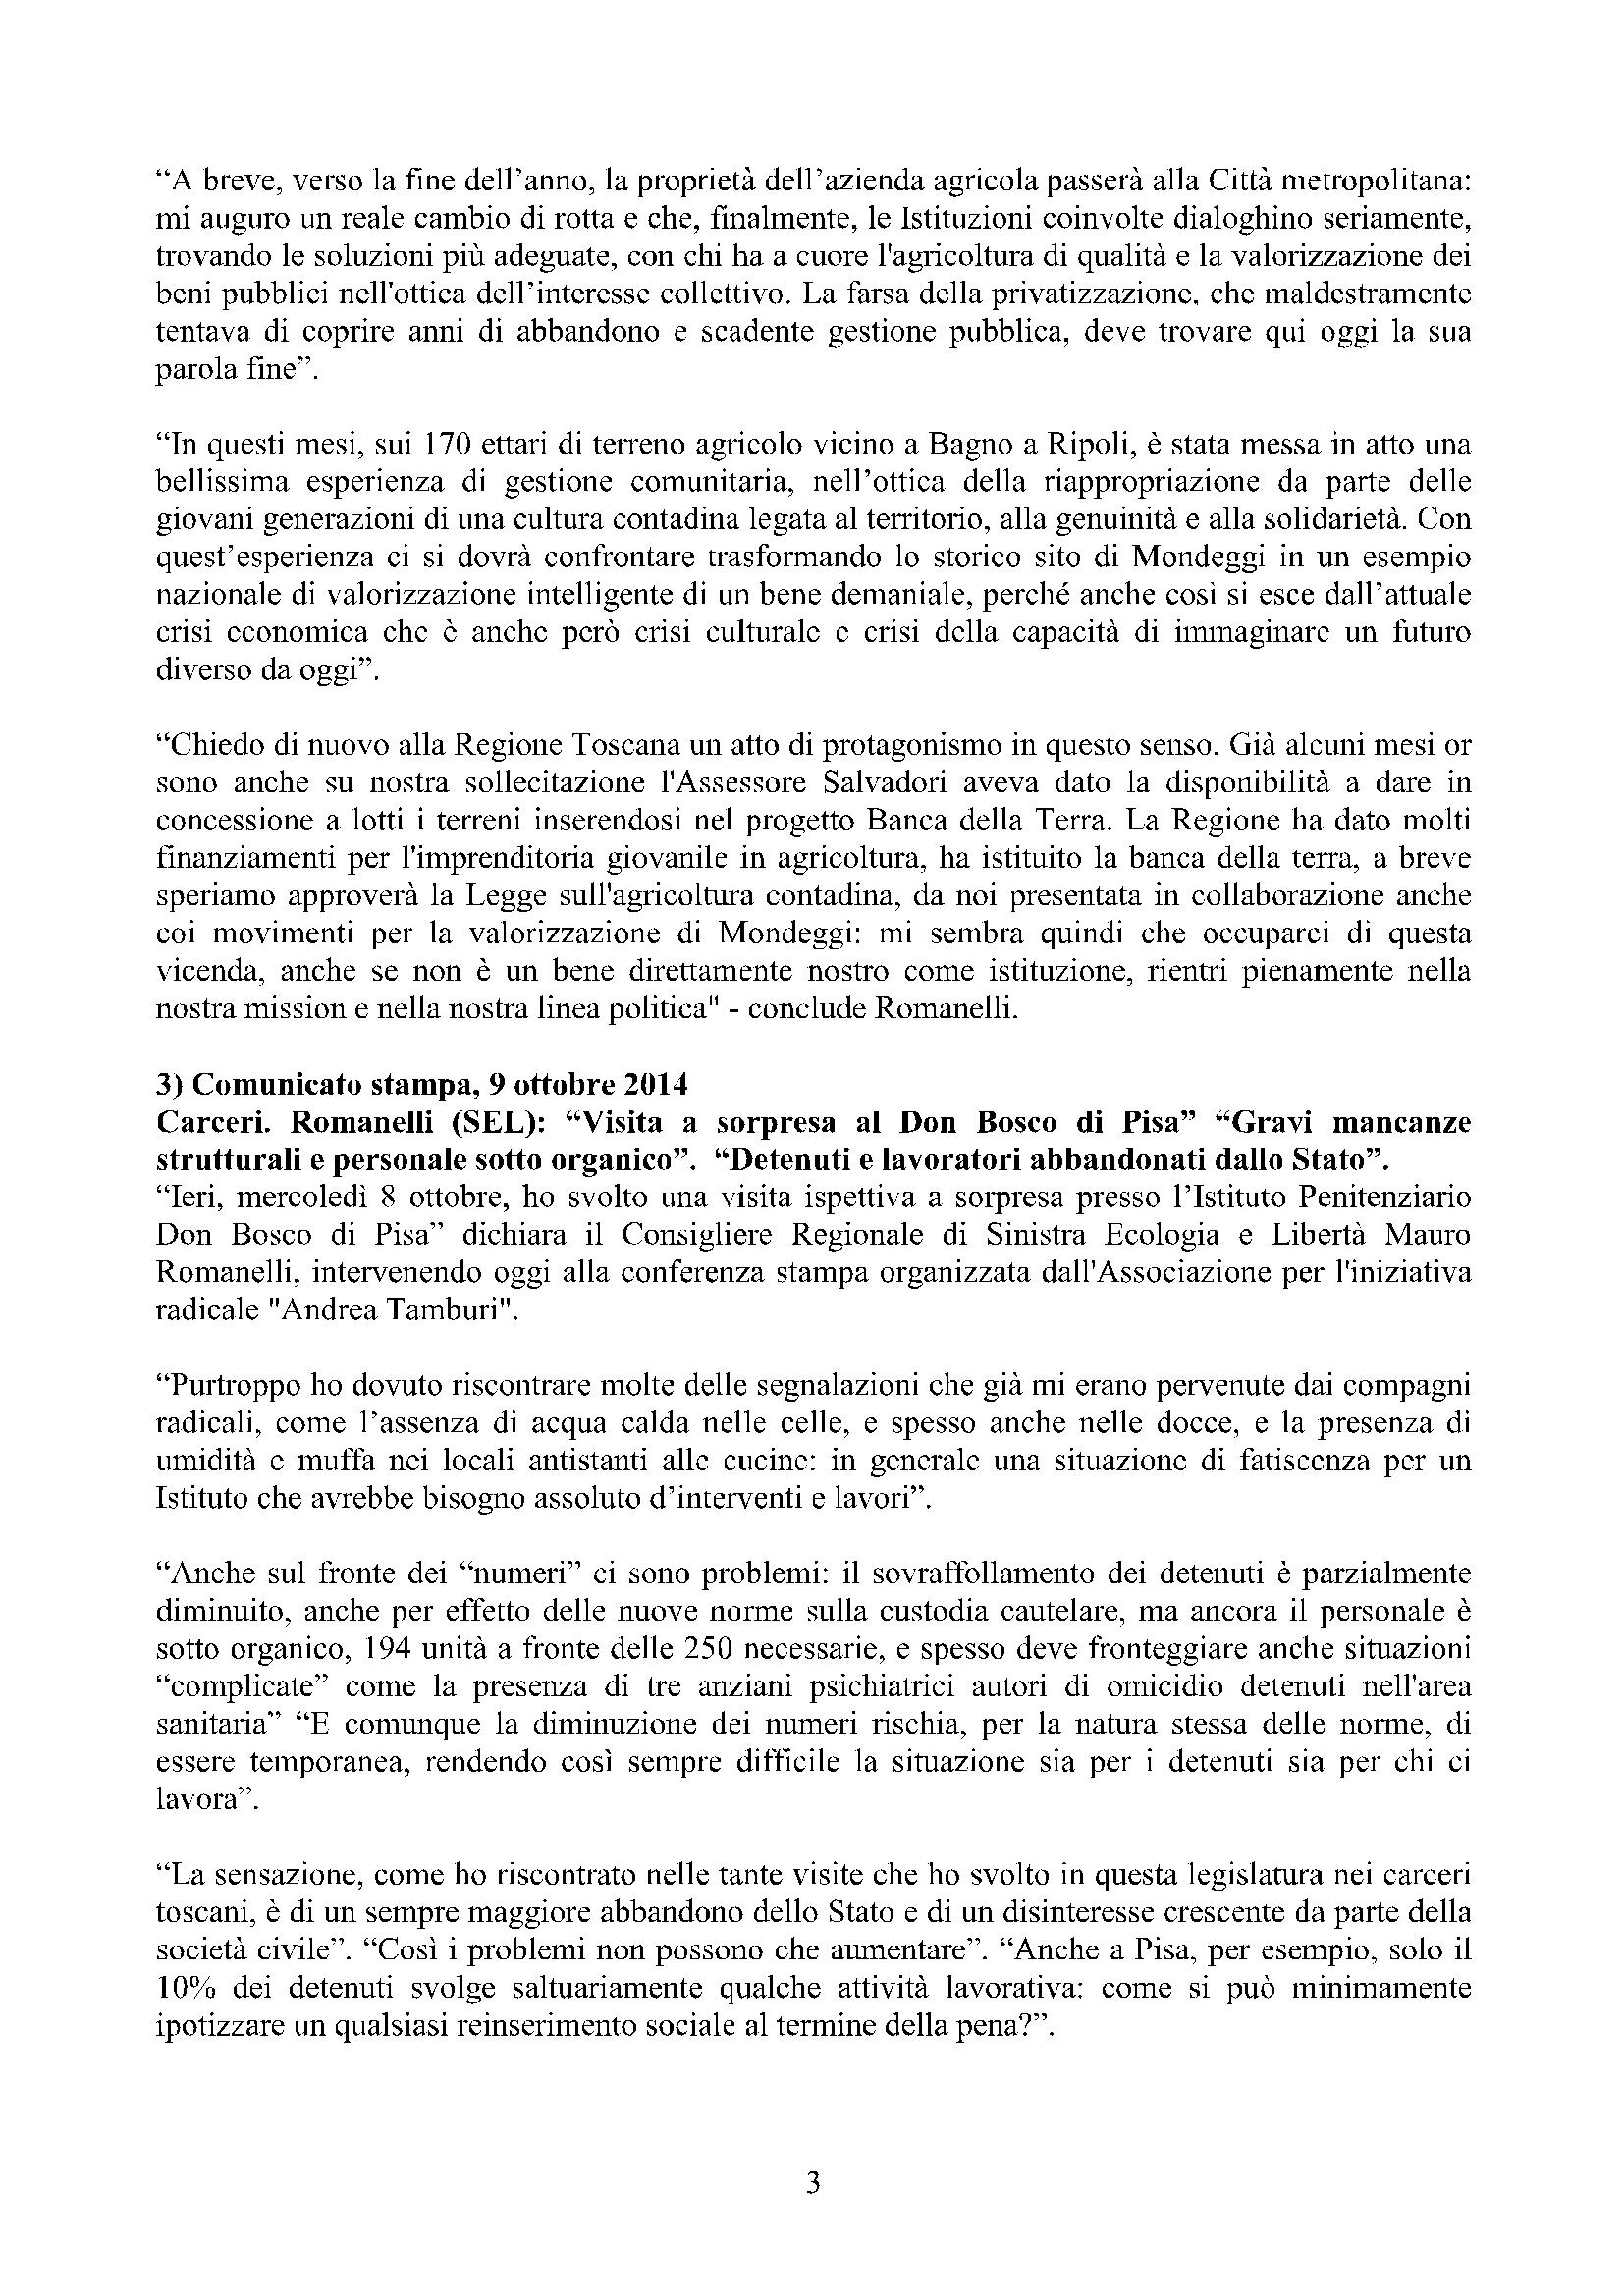 Newsletter di MAURO ROMANELLI Ottobre 2014 – 3